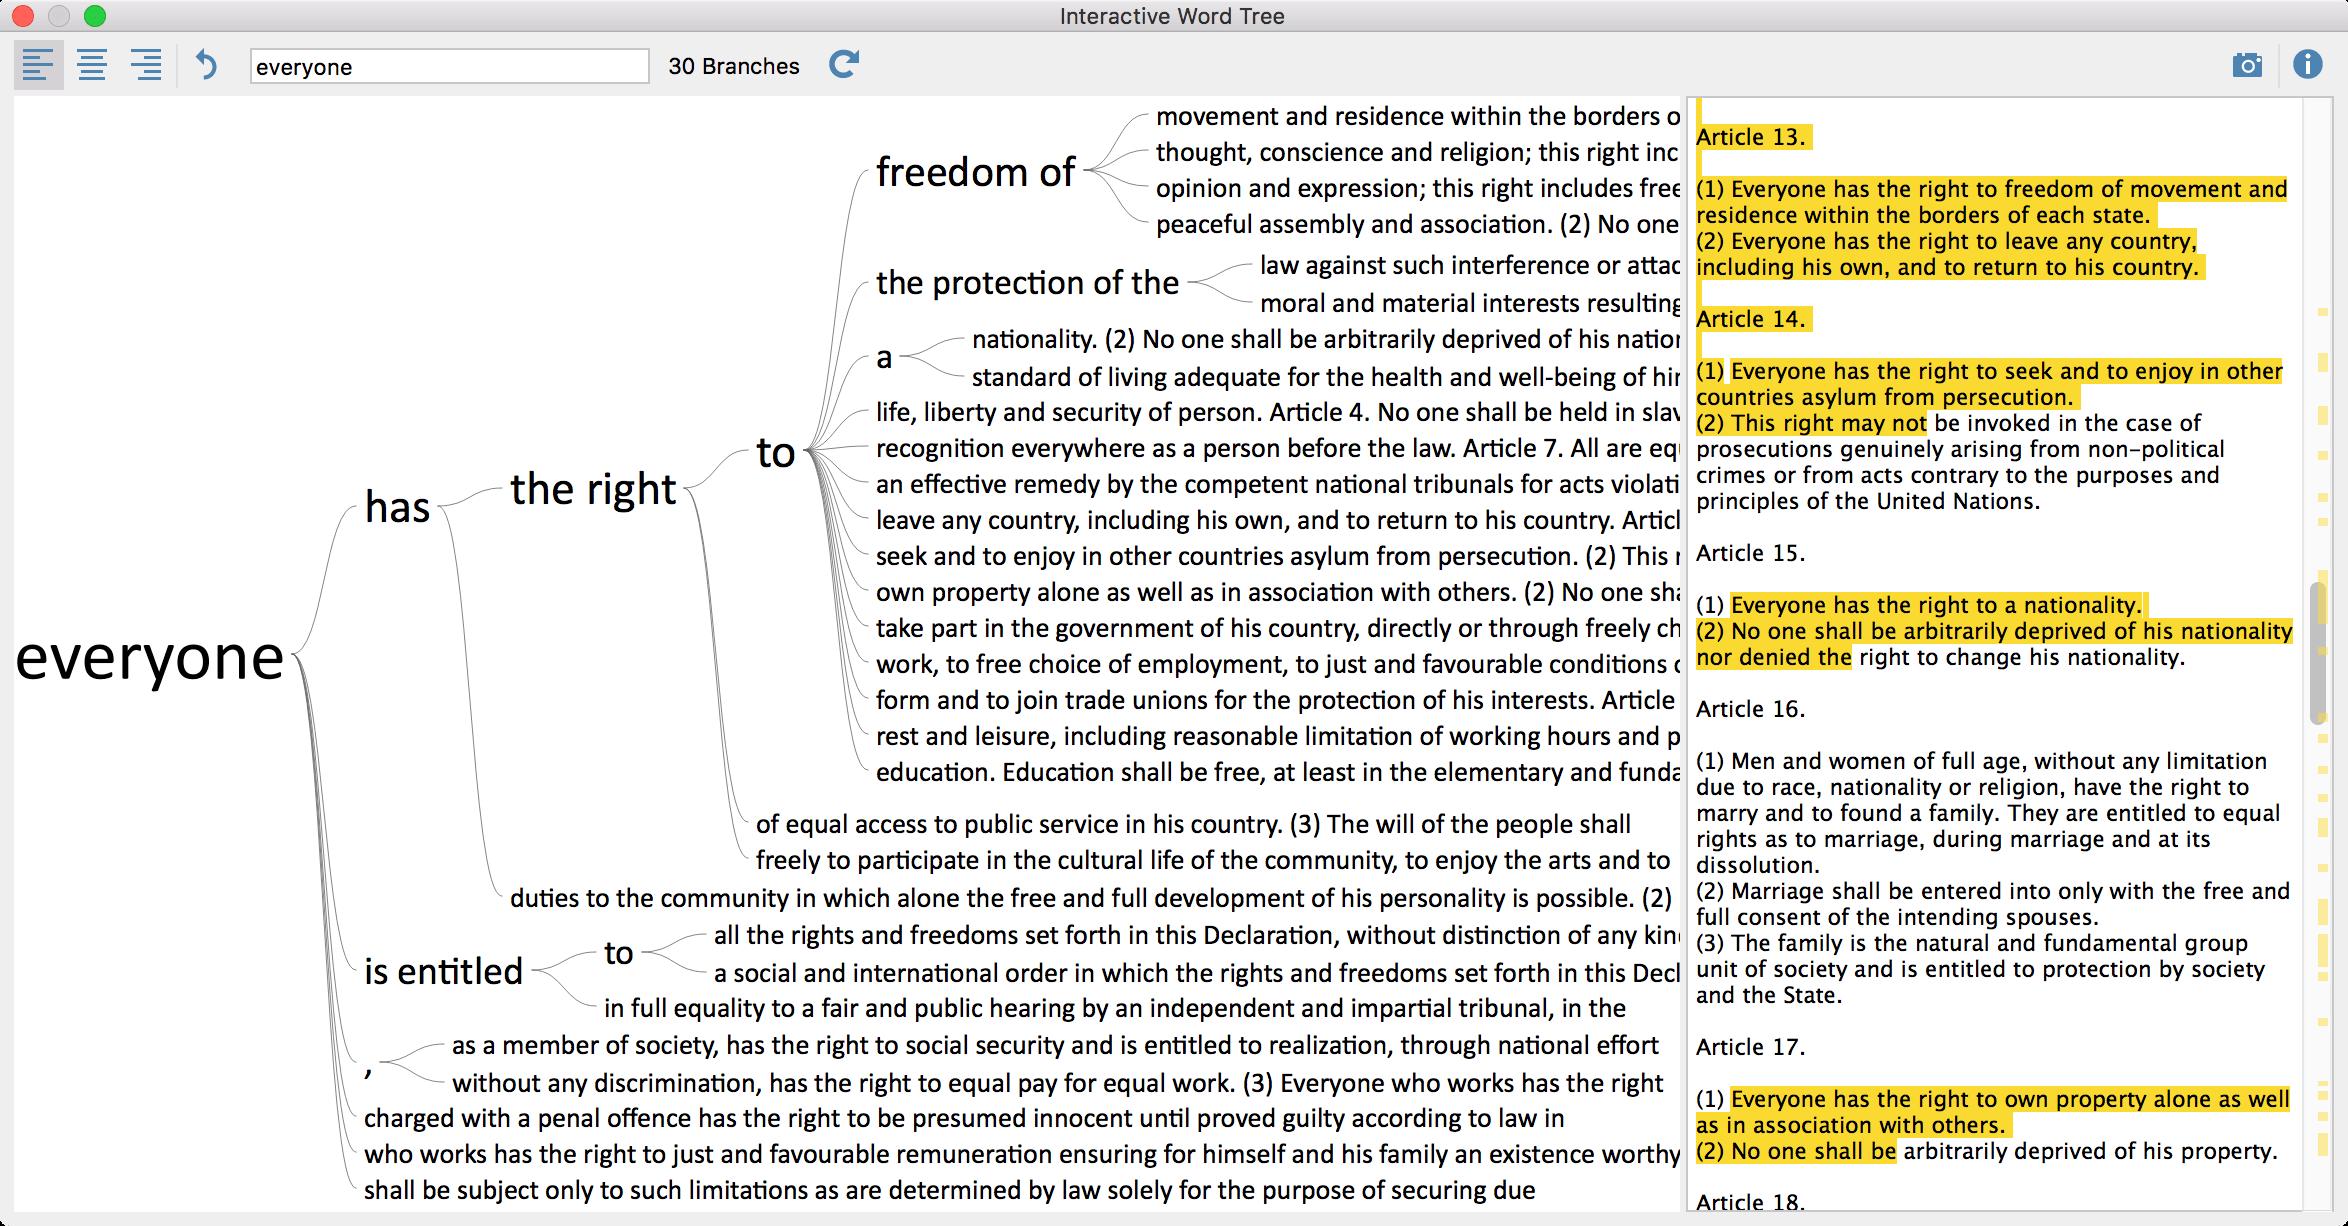 Interactive_Word_tree